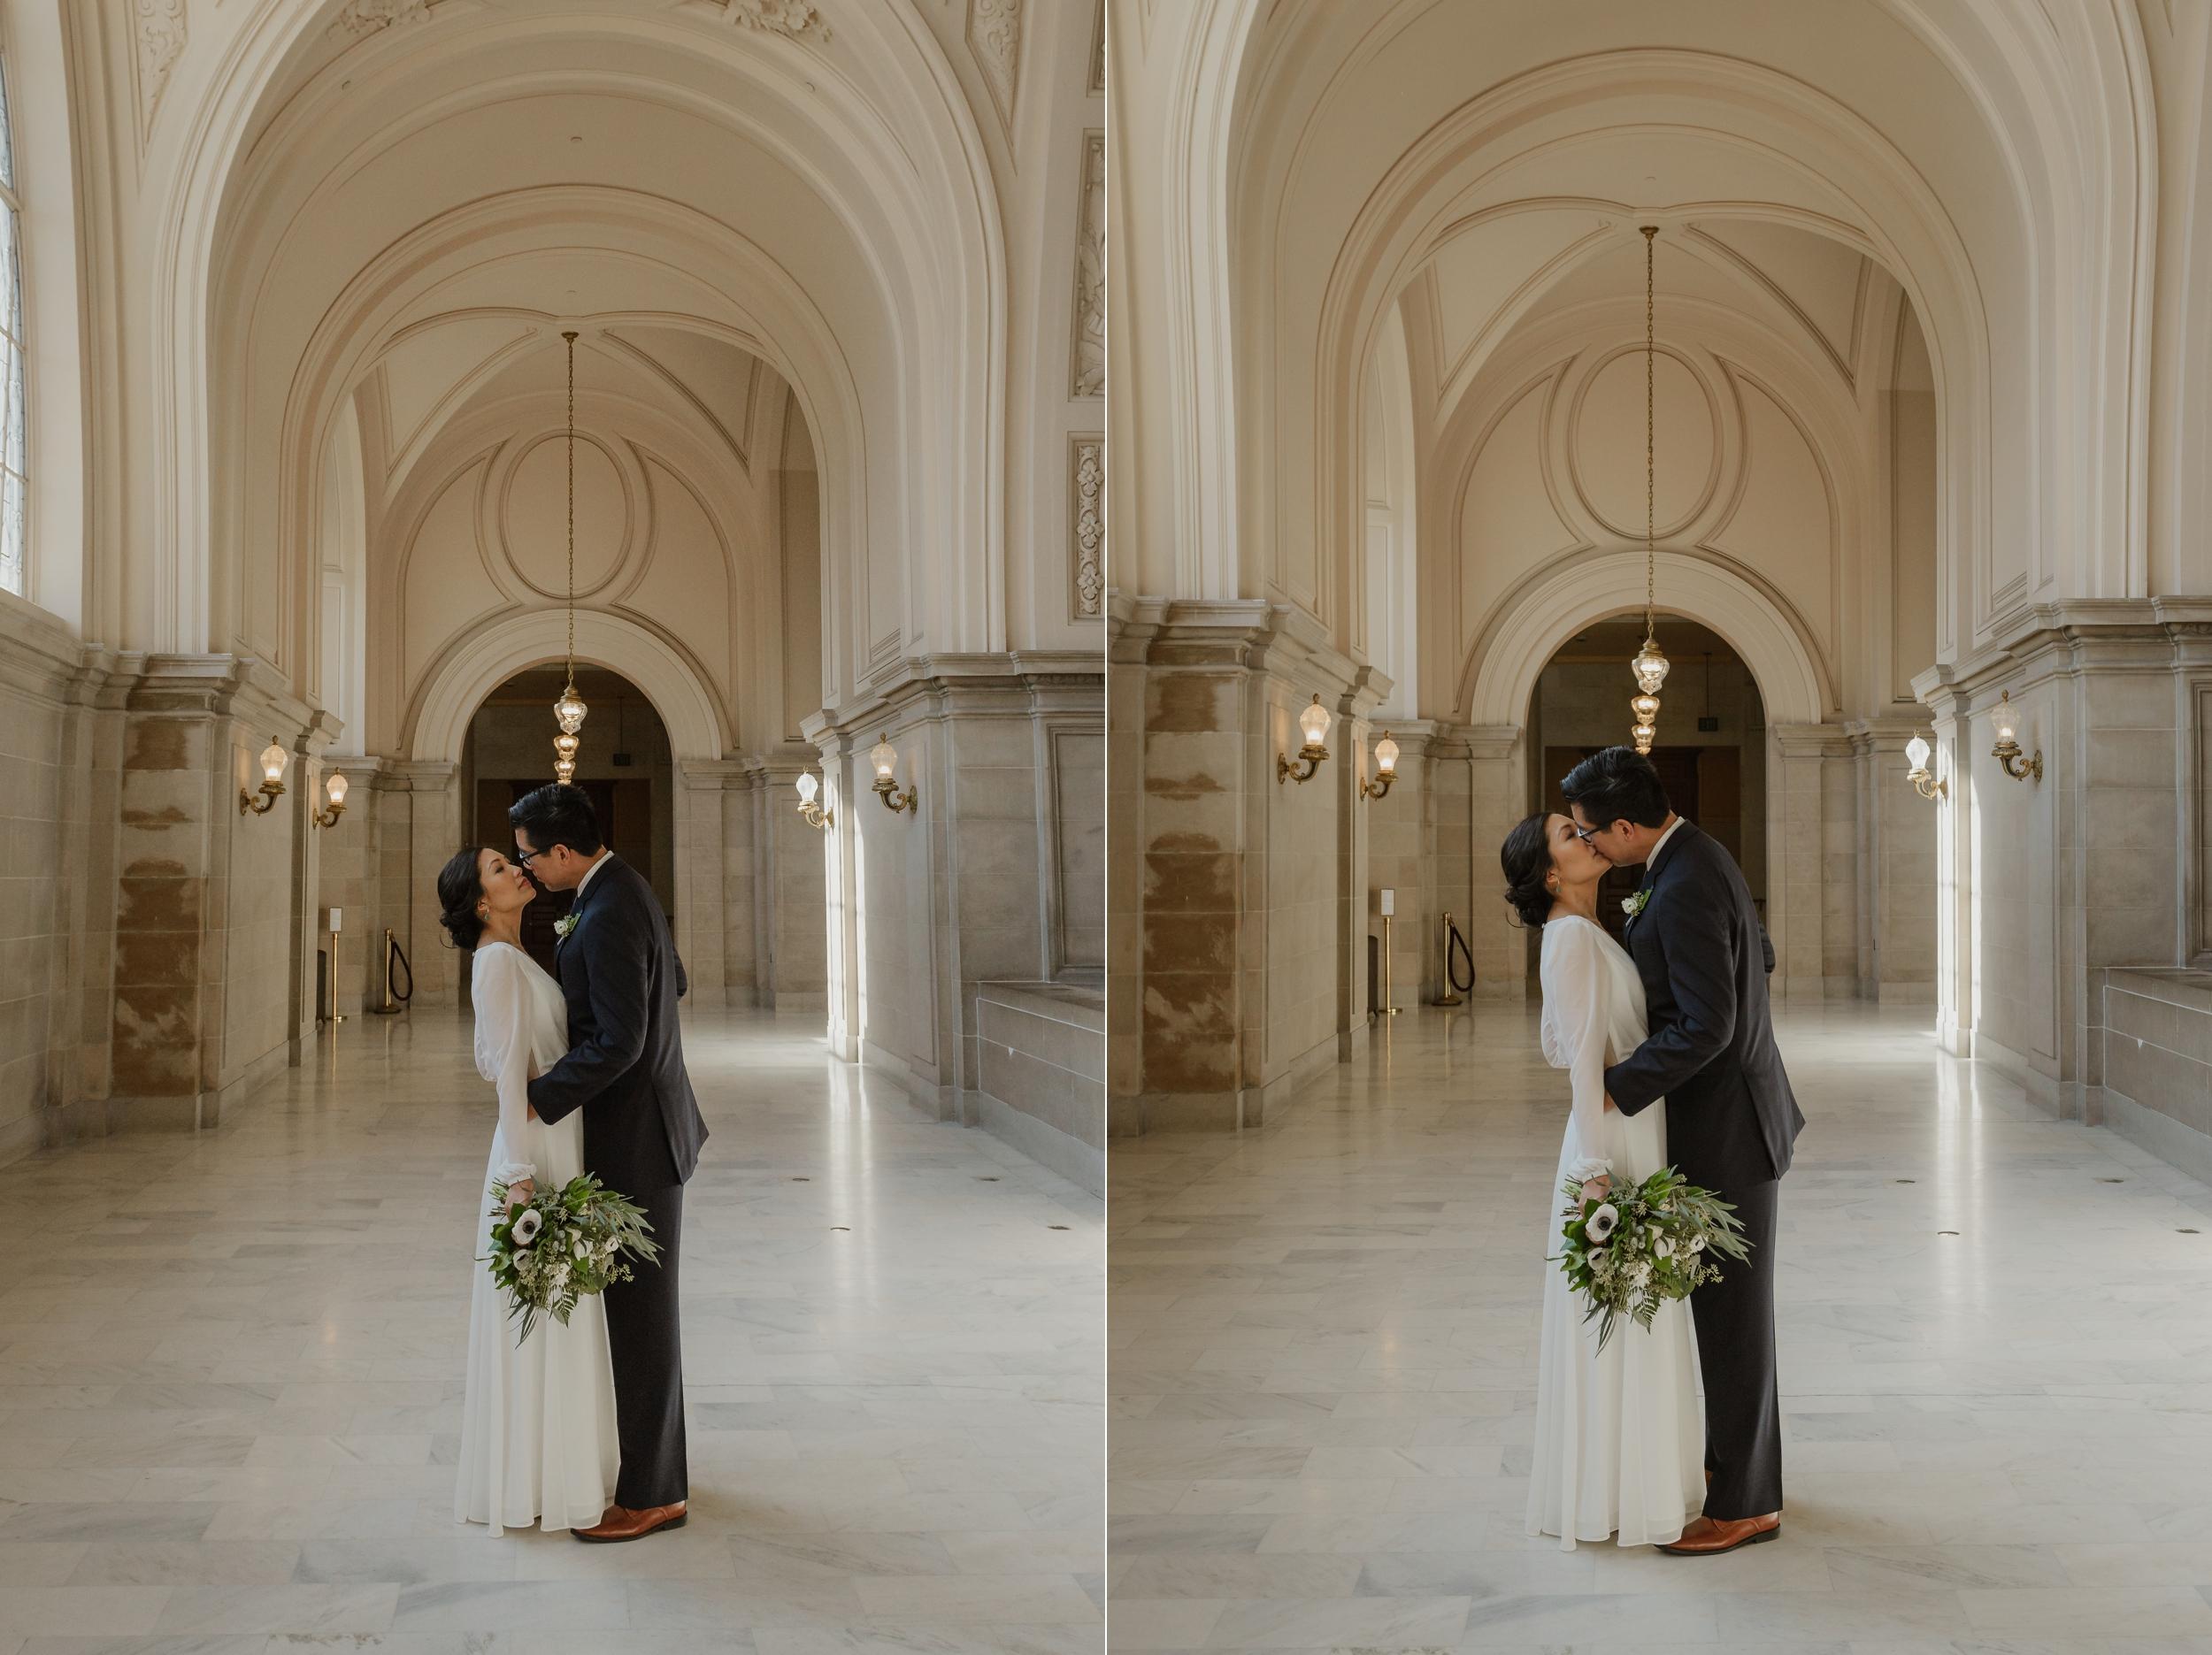 21-winter-san-francisco-city-hall-elopement-vivianchen-185_WEB.jpg